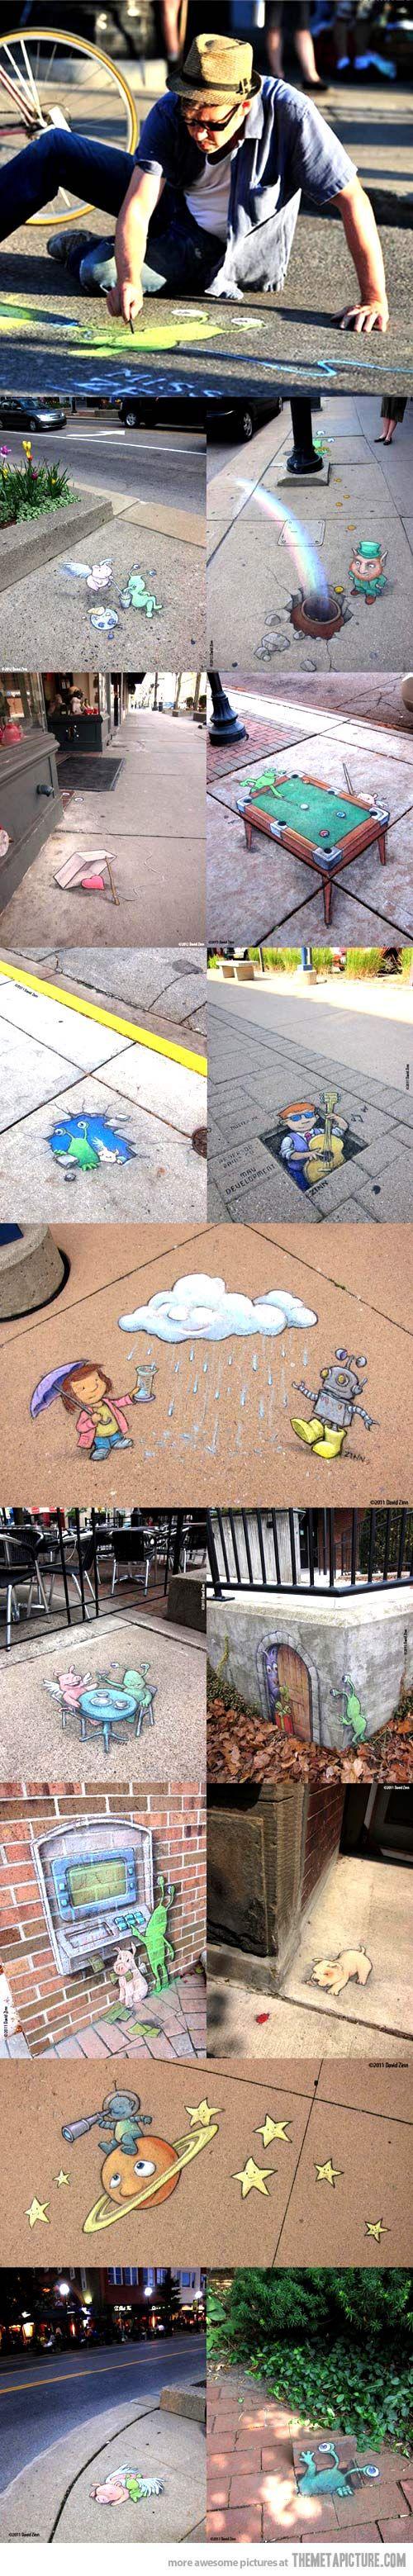 Best David Zinn Ideas On Pinterest Street Art Love Street - David zinns 3d chalk art adorably creative